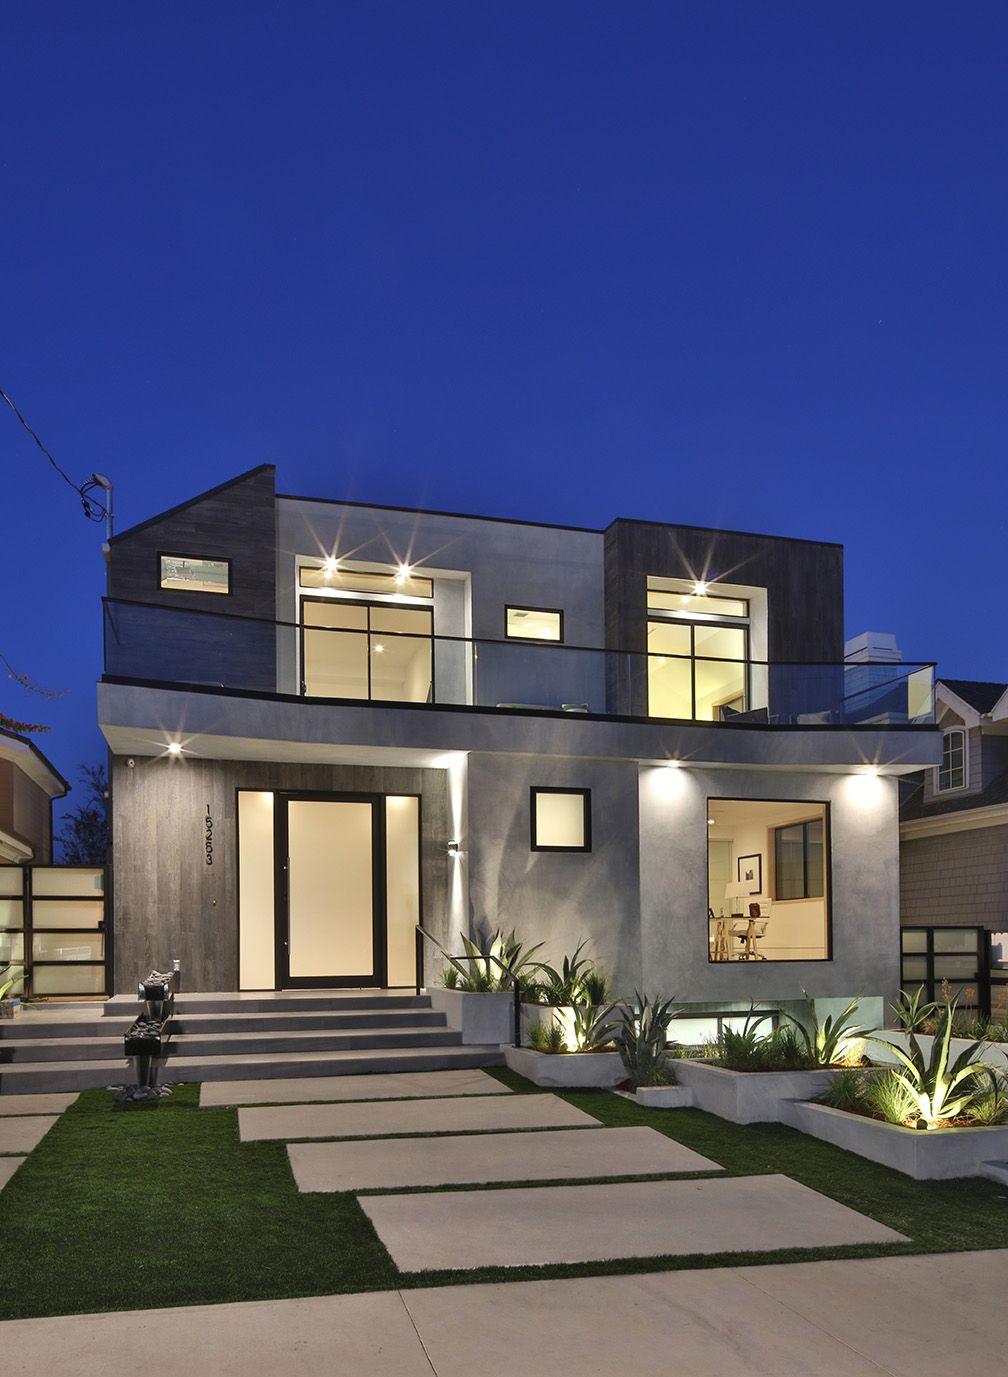 Contemporary Architectural Minimalist Luxury Home Exterior